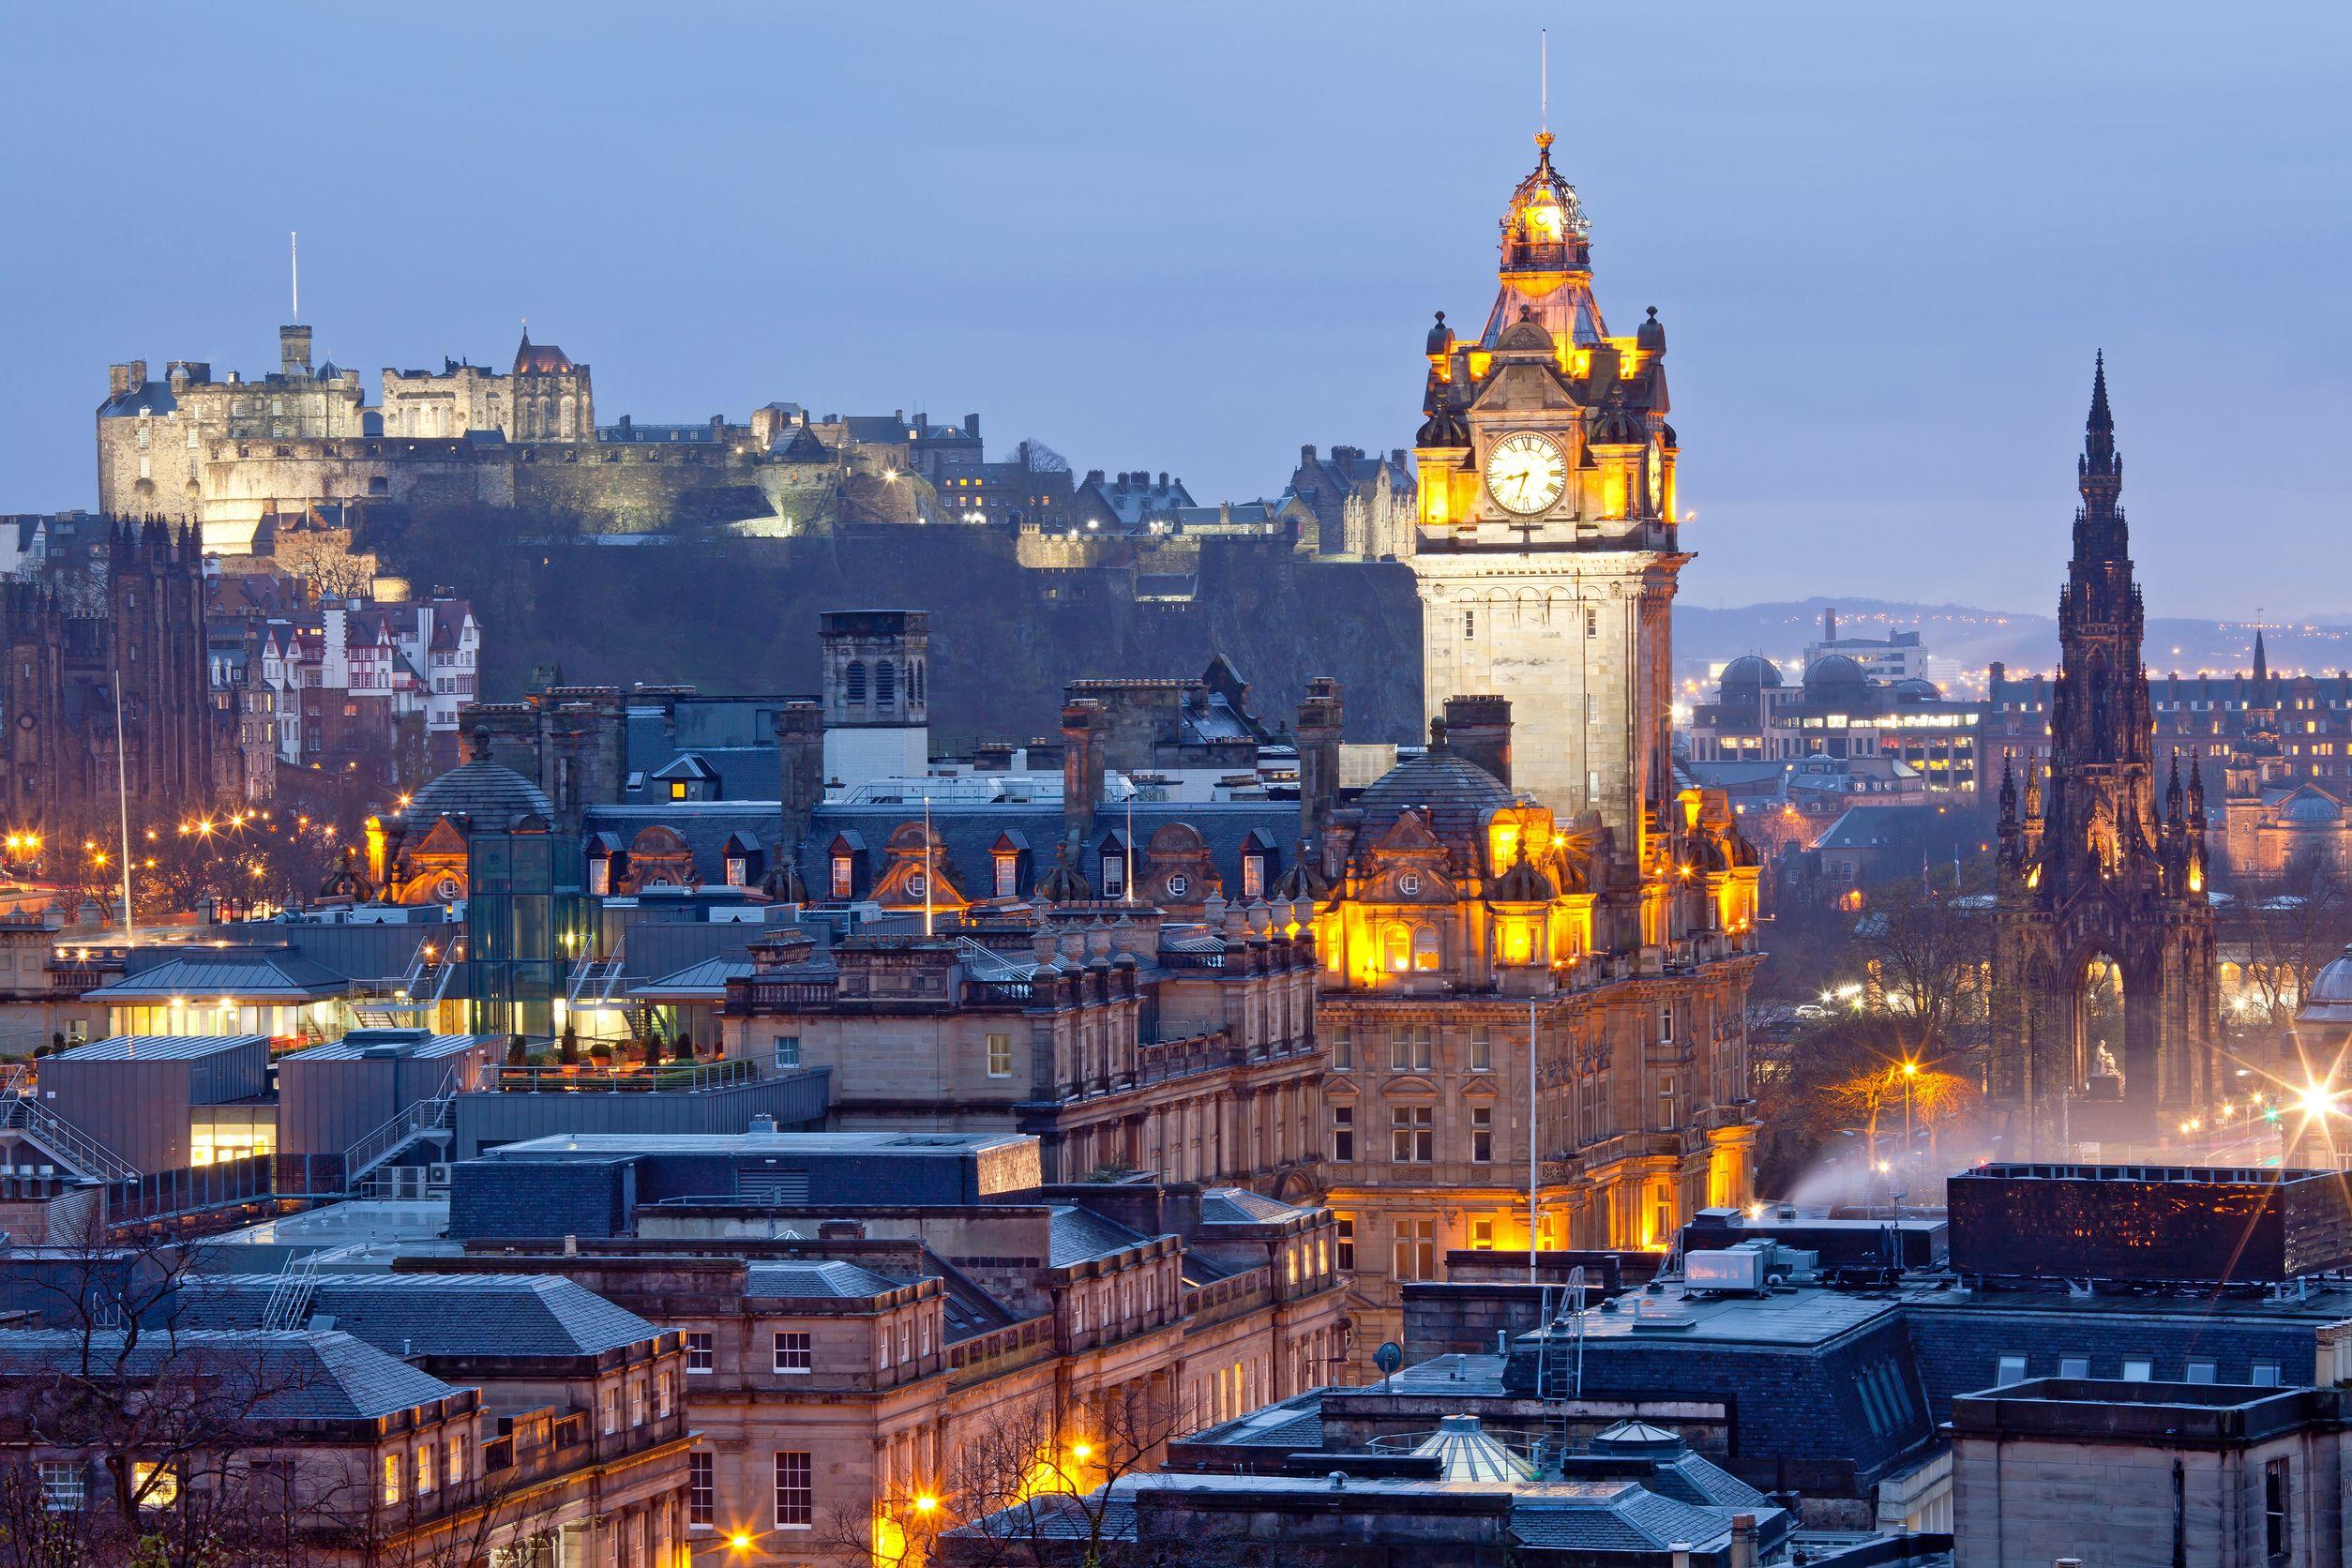 Edinburgh, the inspiring capital of Scotland